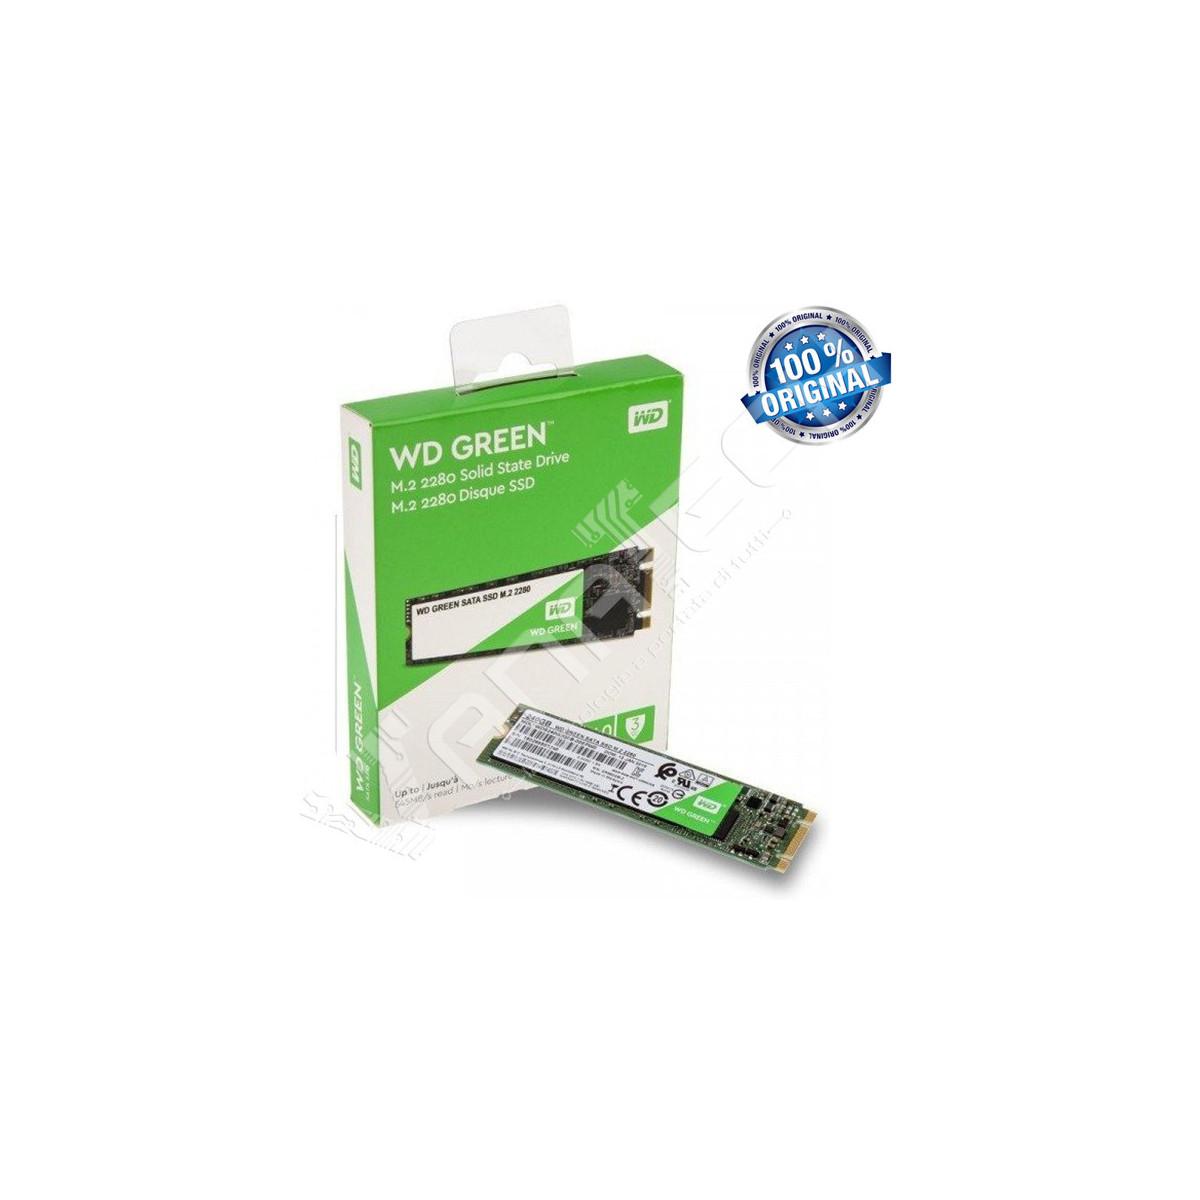 PENDRIVE FLASH USB 2.0 VERBATIM 8GB STORE'N'GO DRIVE PENNETTA NERA 98695